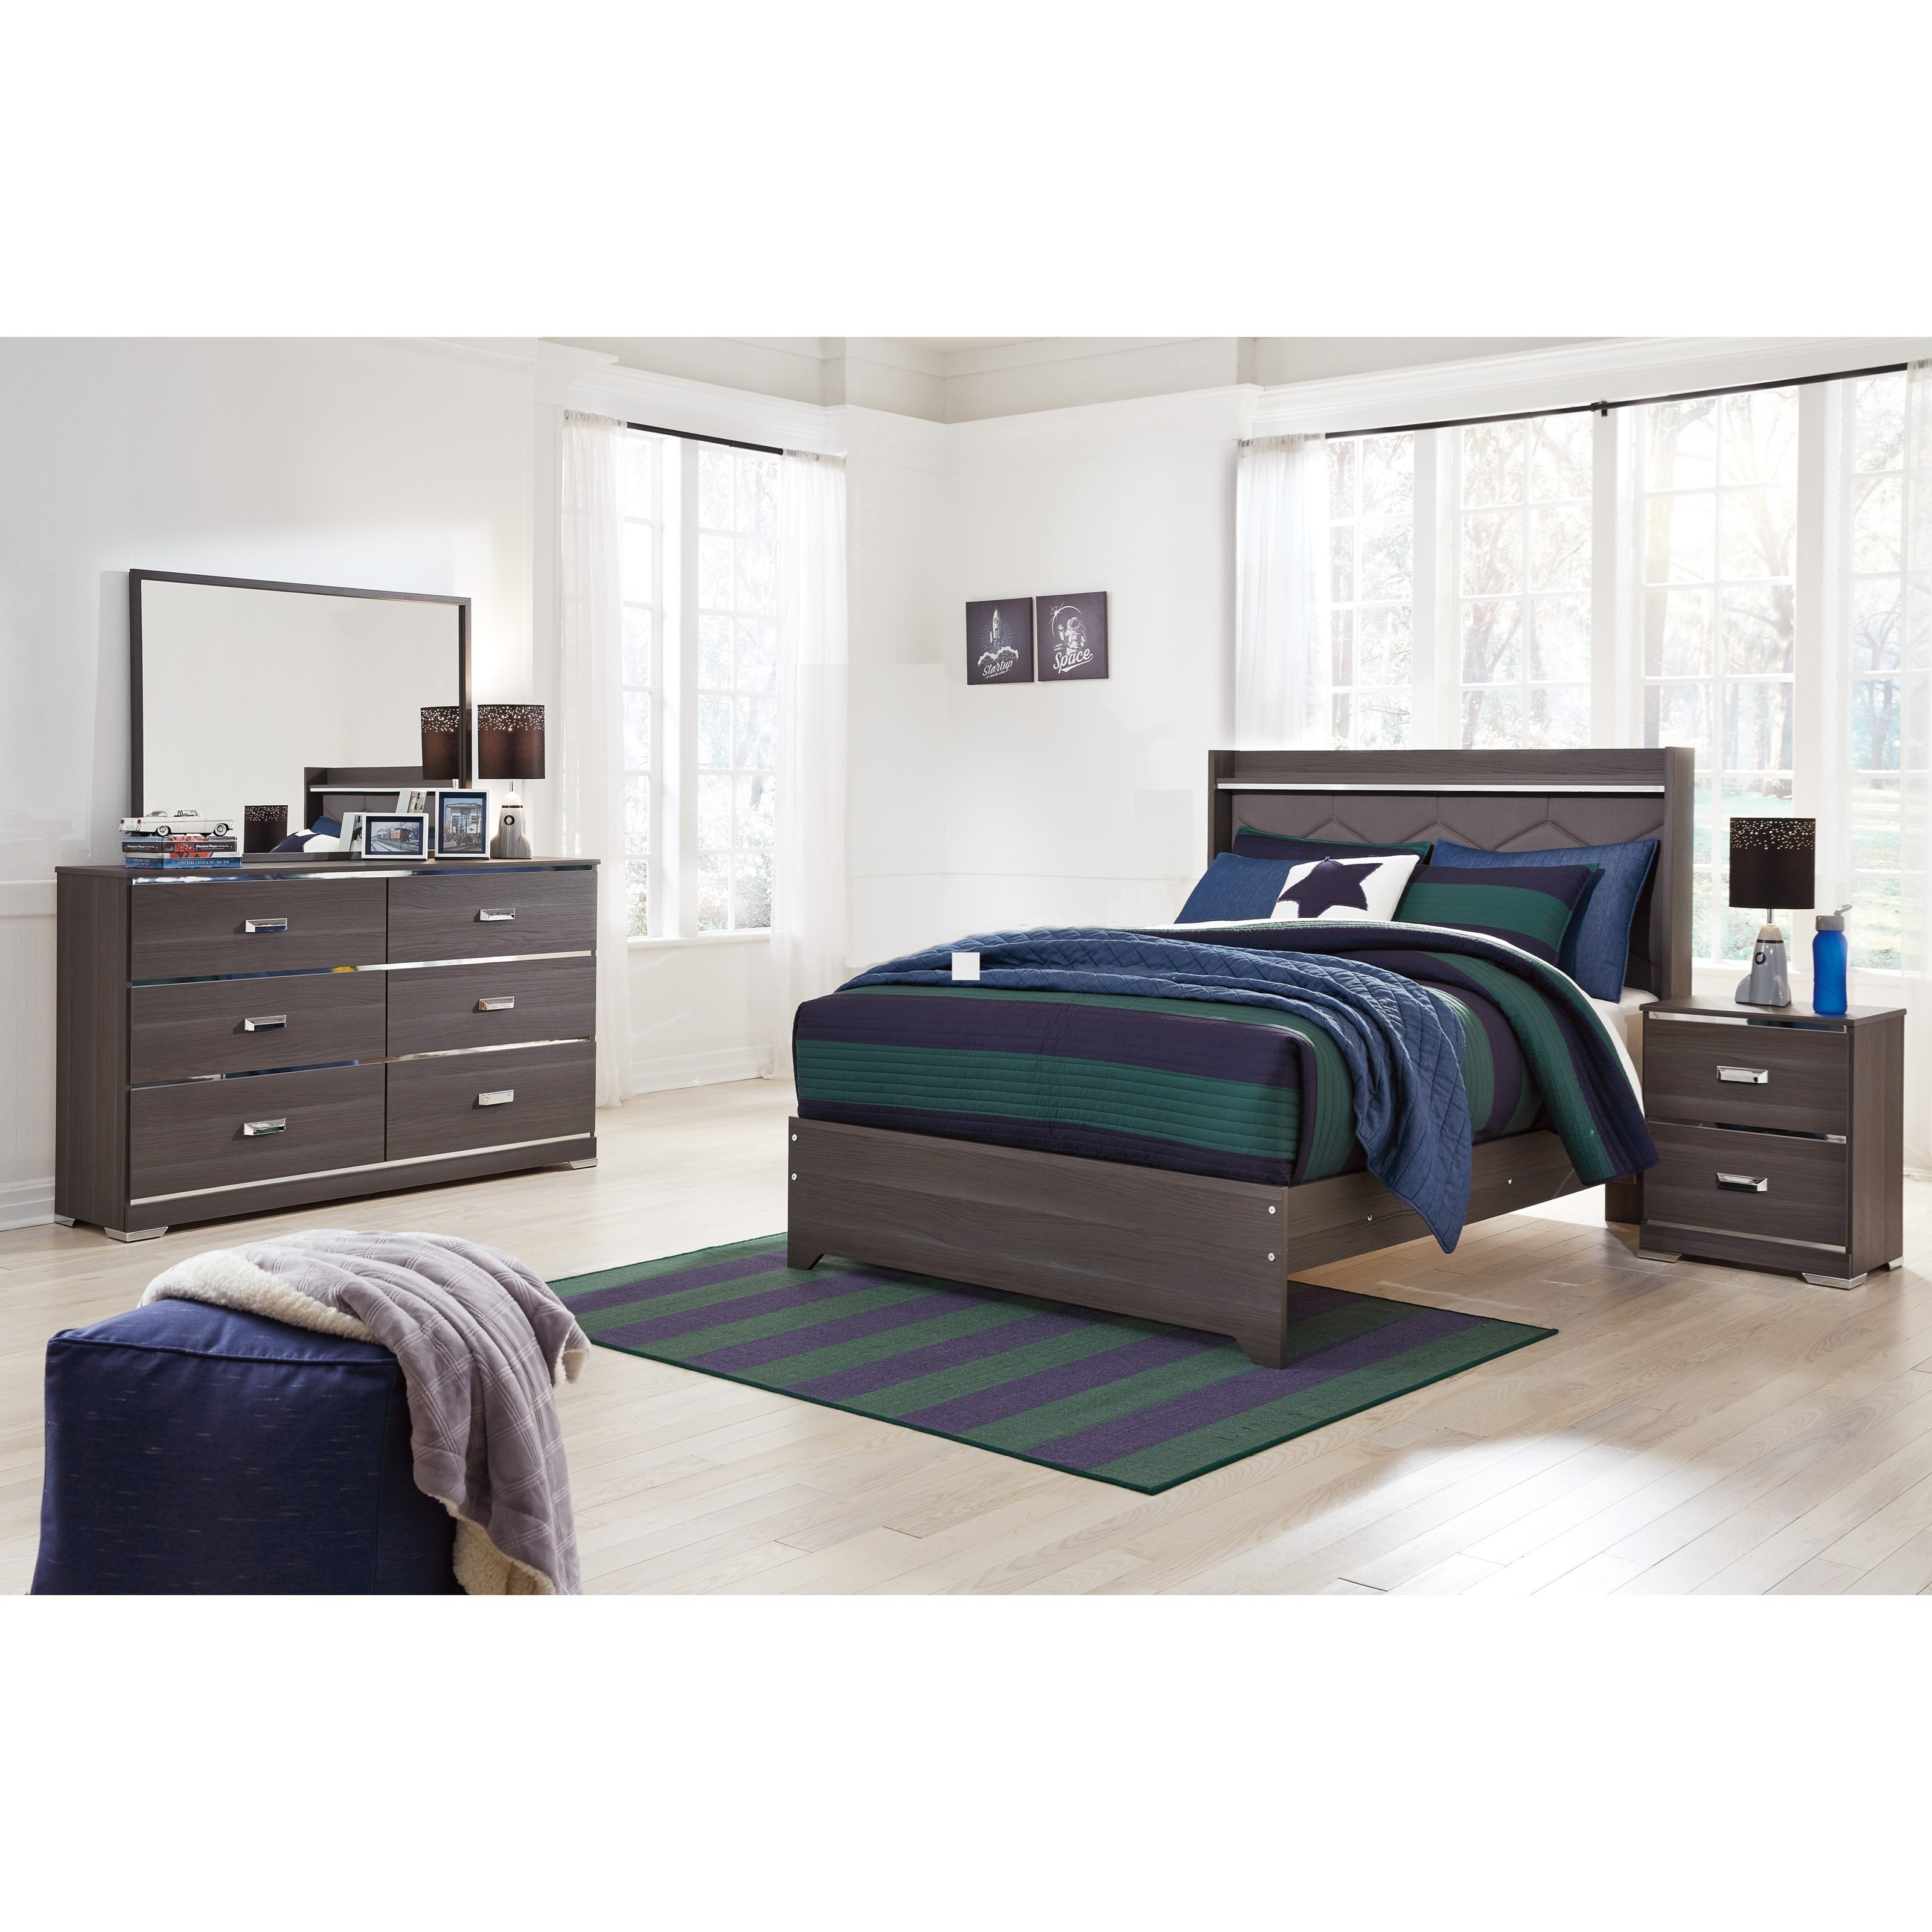 Signature Design by Ashley Annikus Full Bedroom Group - Item Number: B132 F Bedroom Group 2